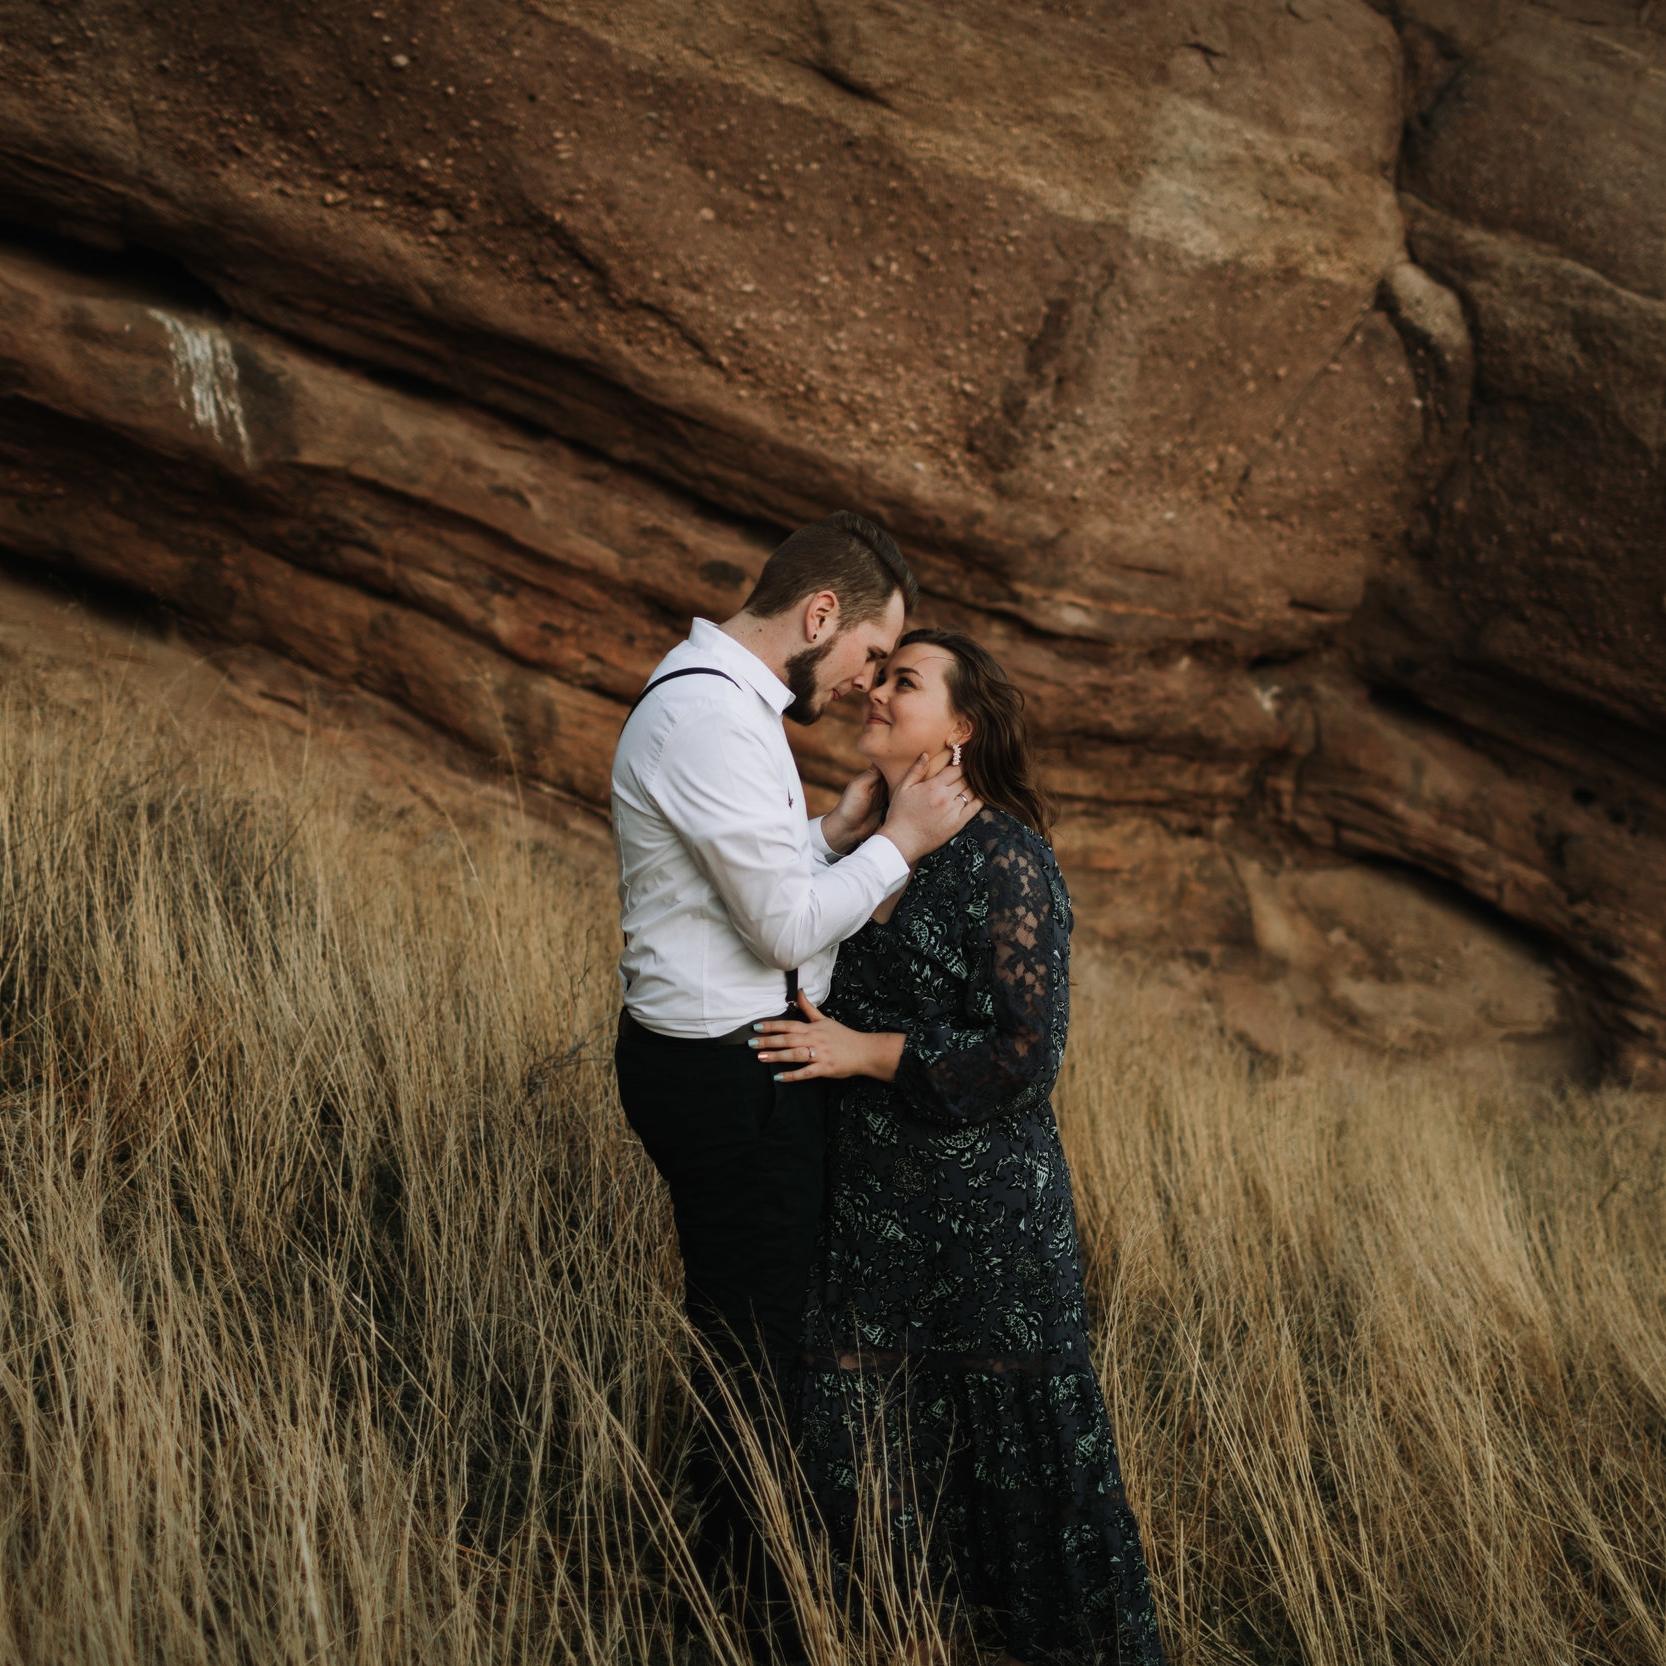 Zachary + Chelsea | Engagement Session | Vasquez Rocks, CA